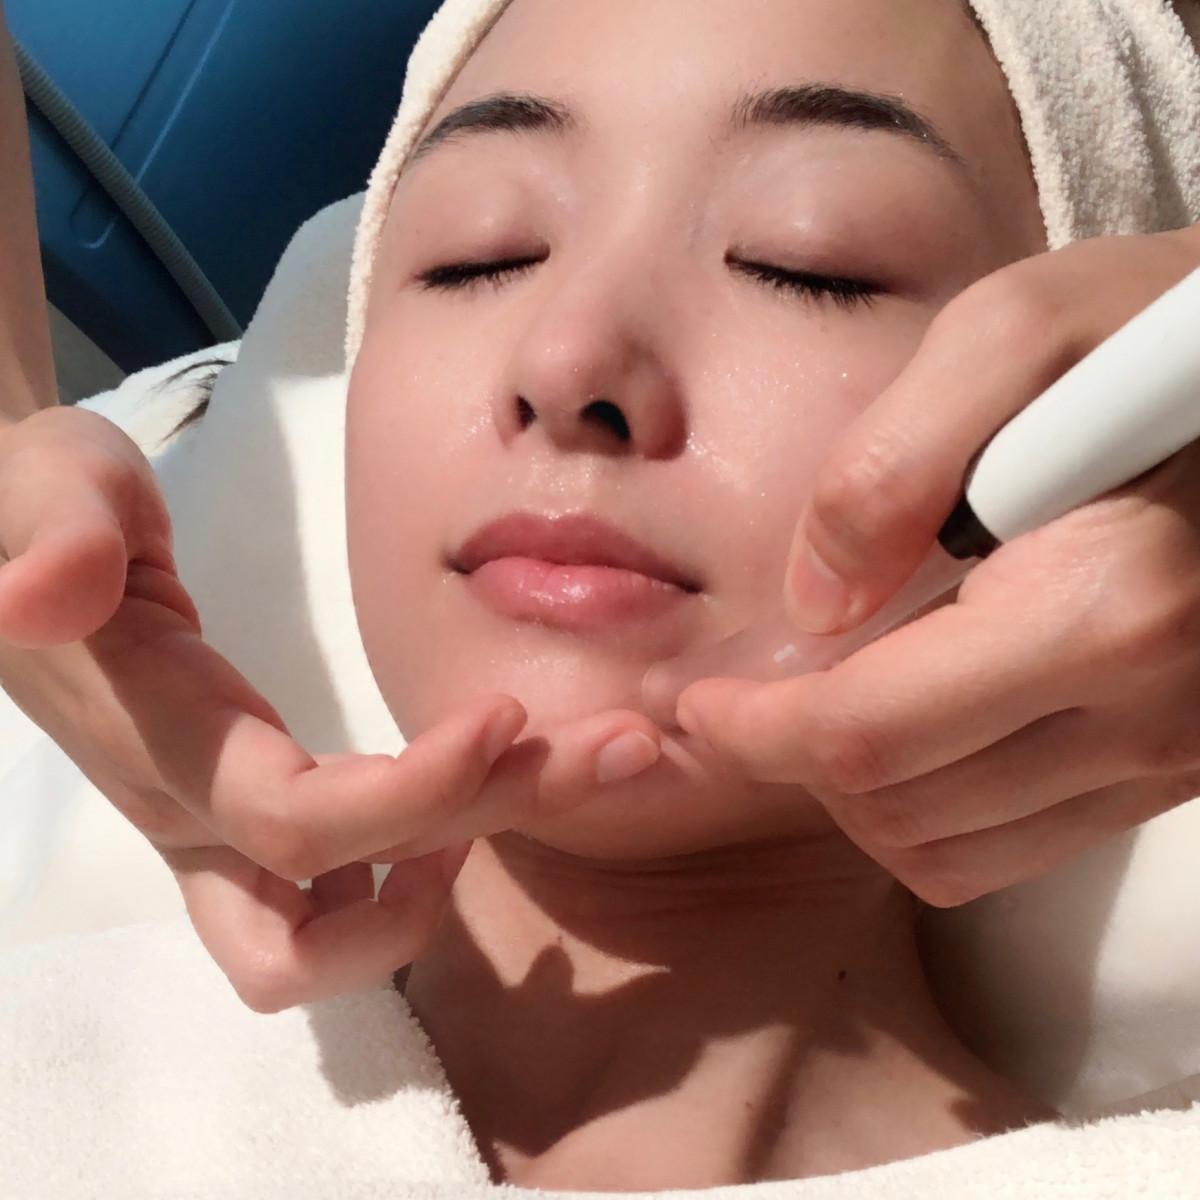 【wedding】美容医療5種を徹底レポート*タカミクリニックのブライダルコース_1_3